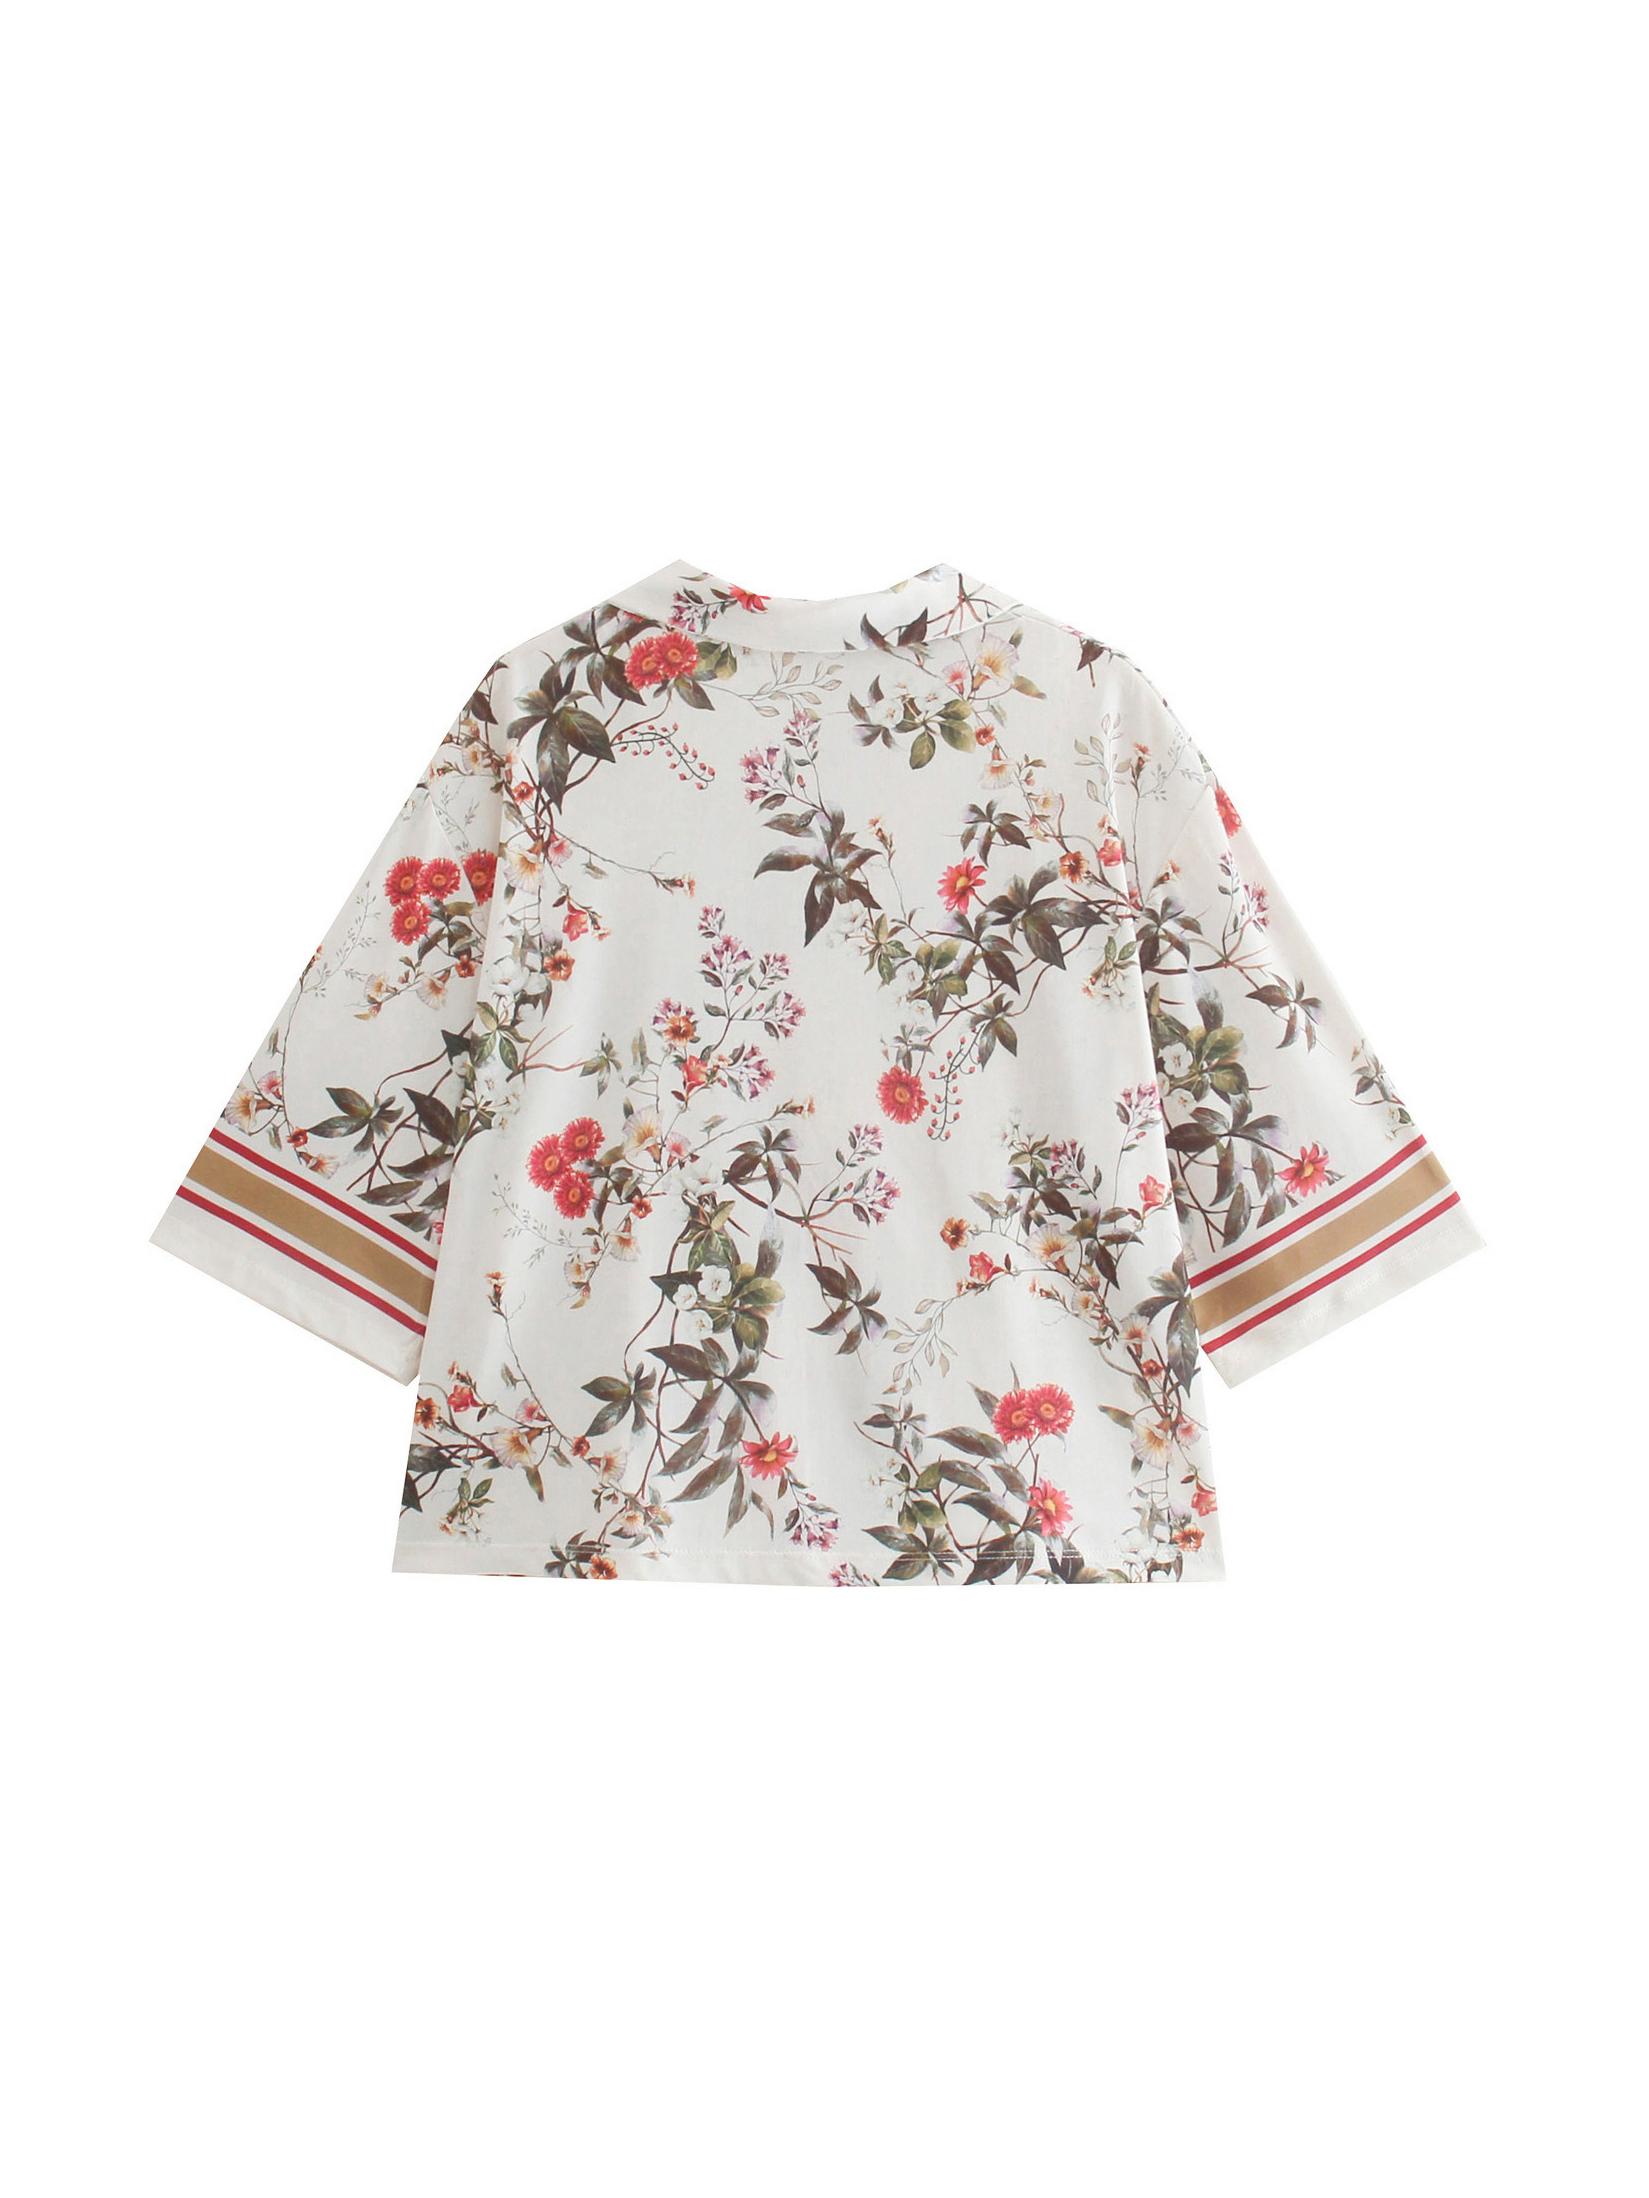 Youthful Flower Print Short Sleeve Blouse For Women